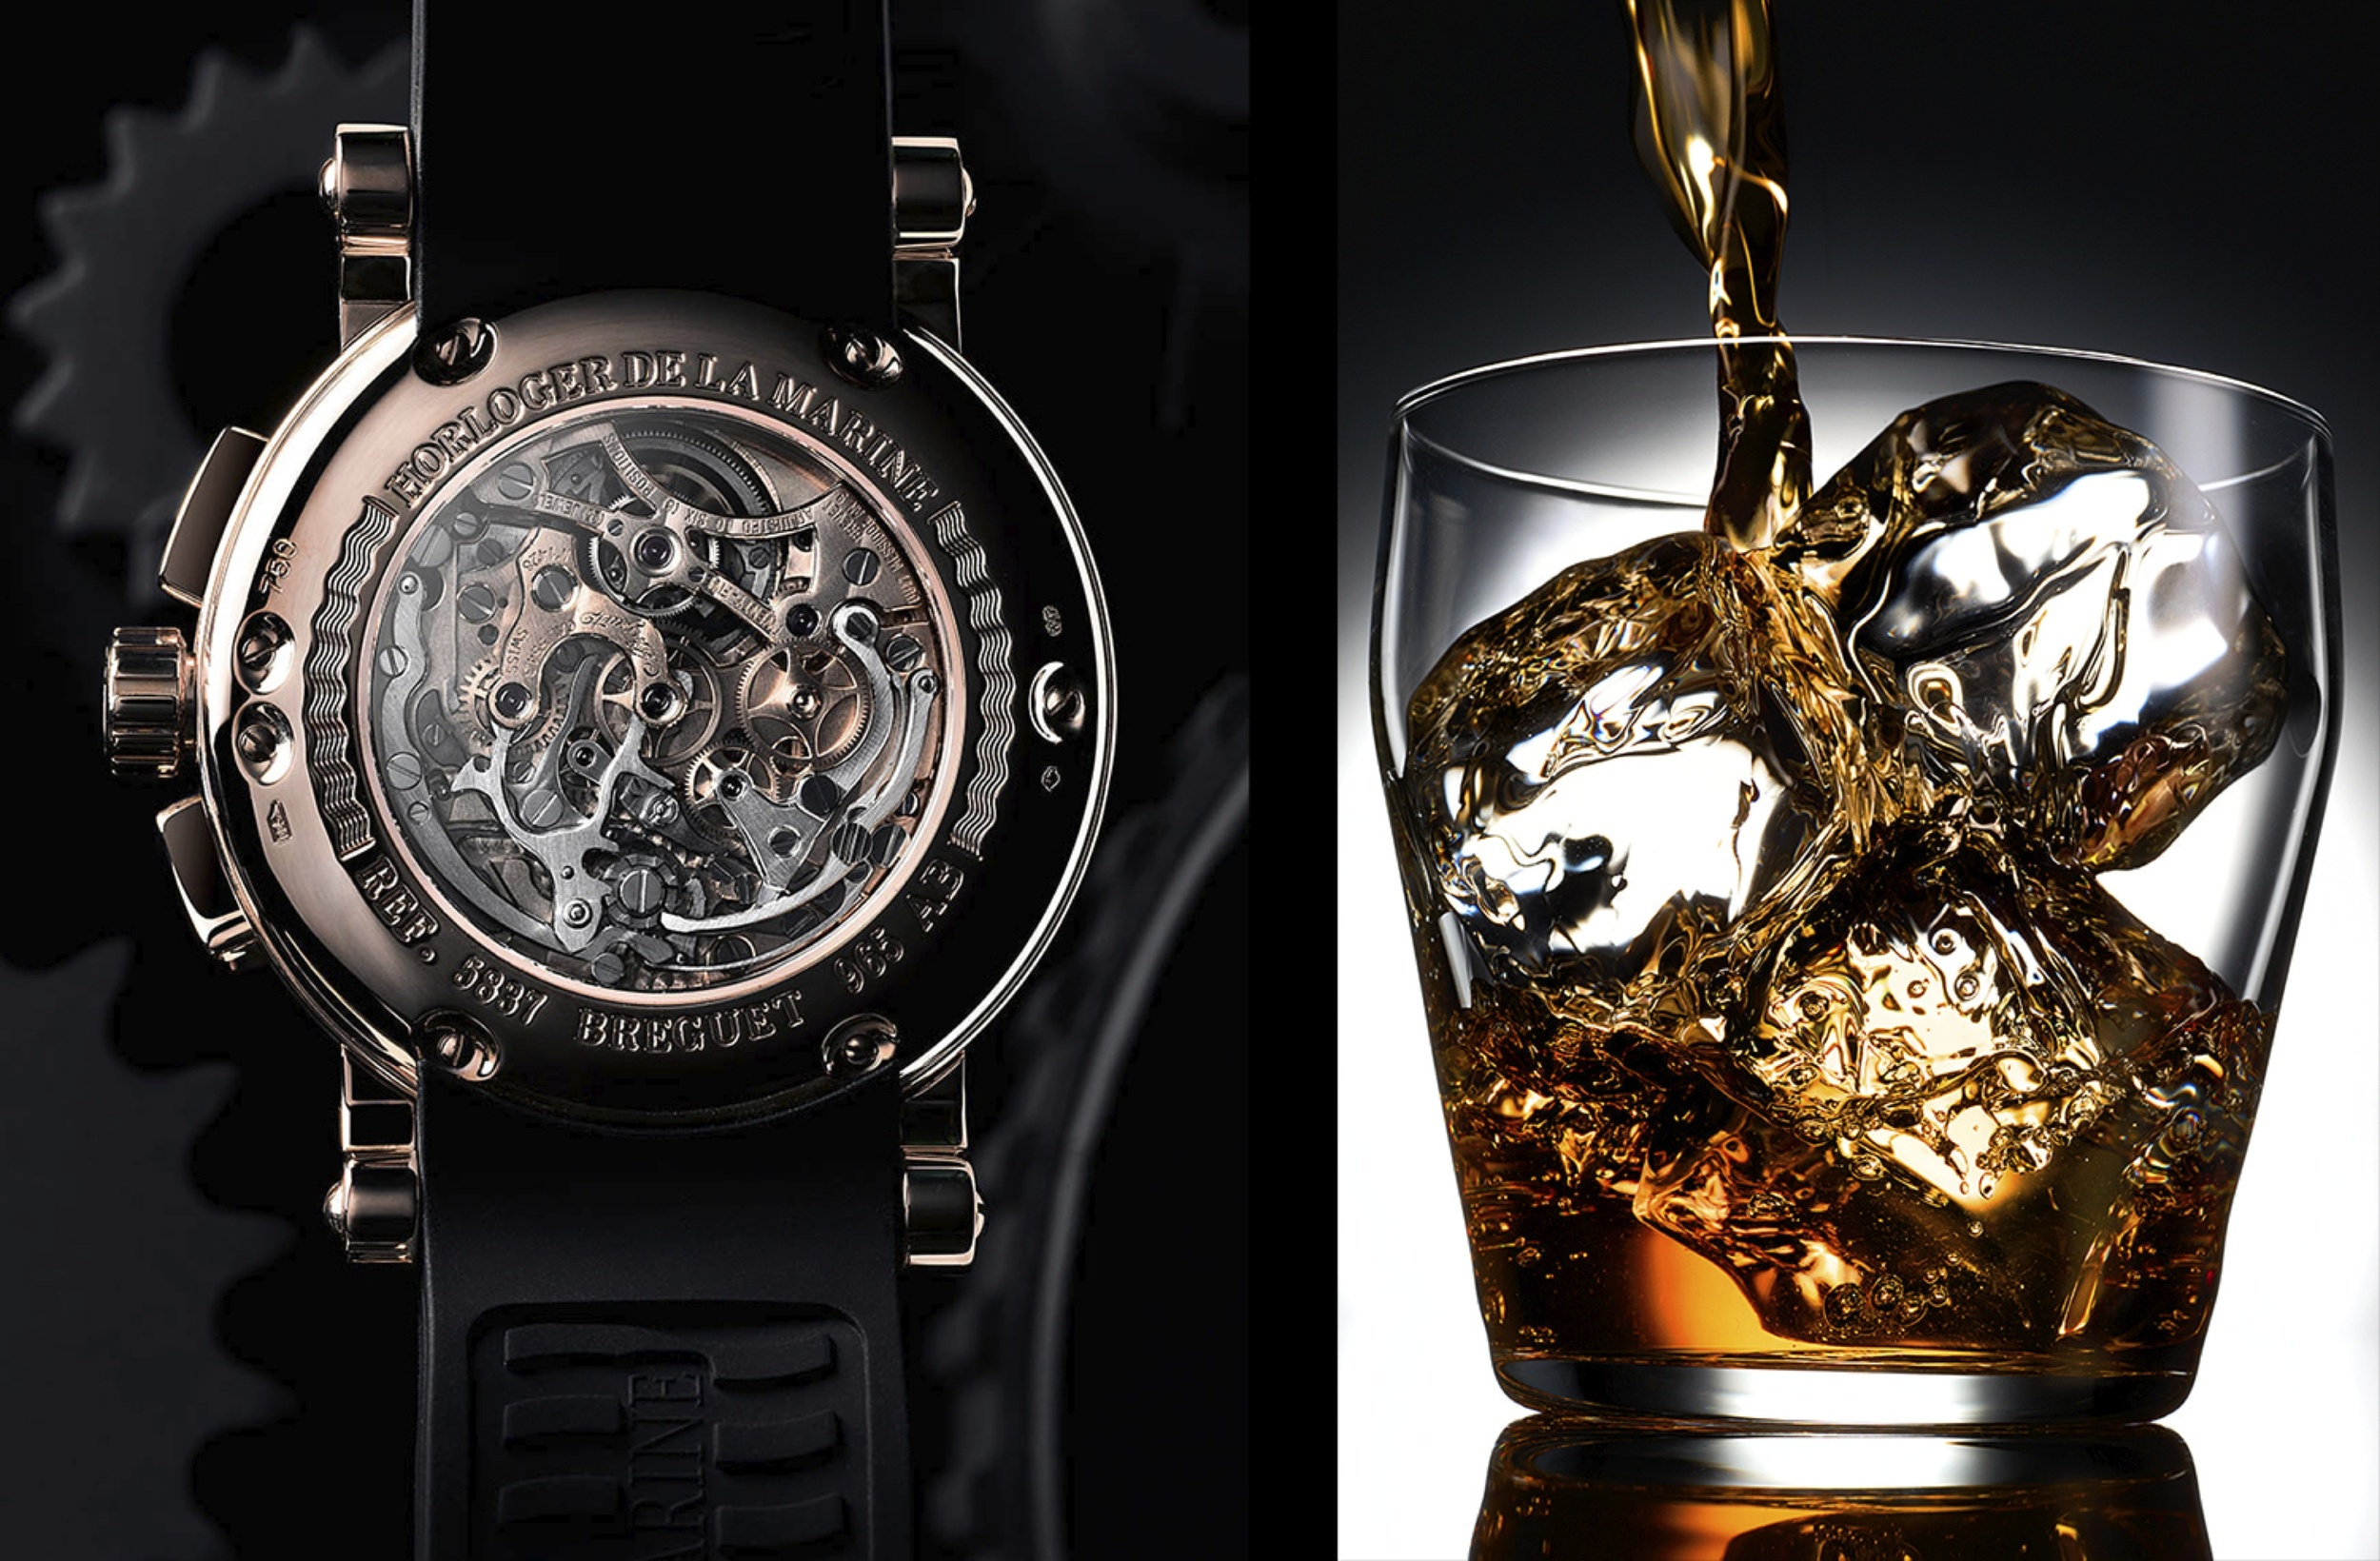 Watch_Drink_1.jpg